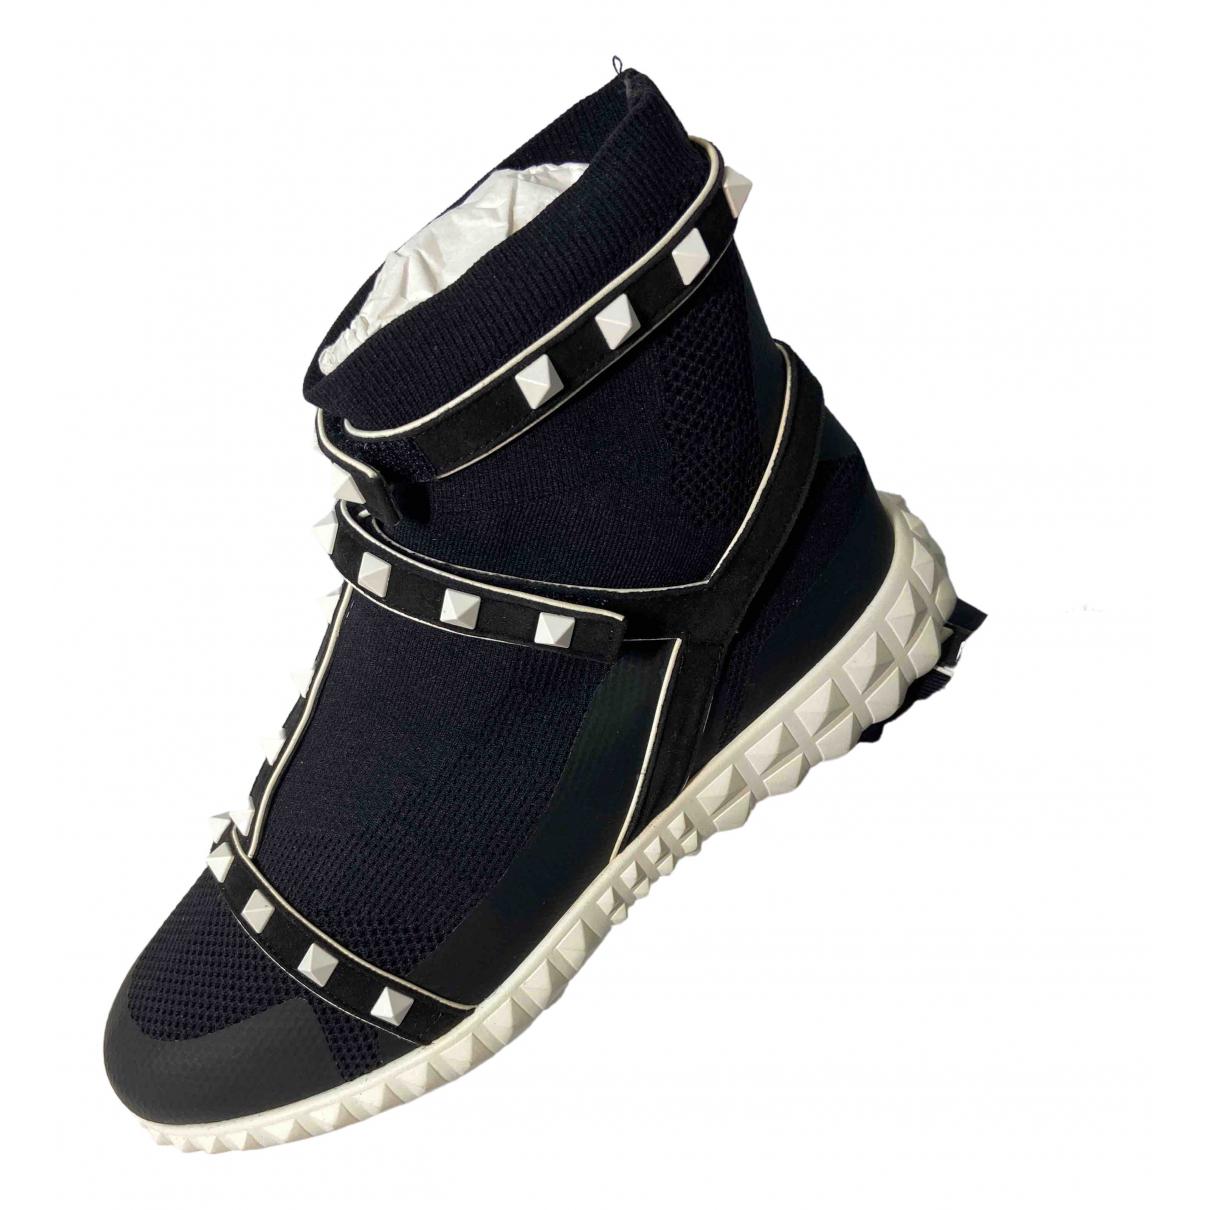 Deportivas Sneakers chaussettes VLTN  de Cuero Valentino Garavani